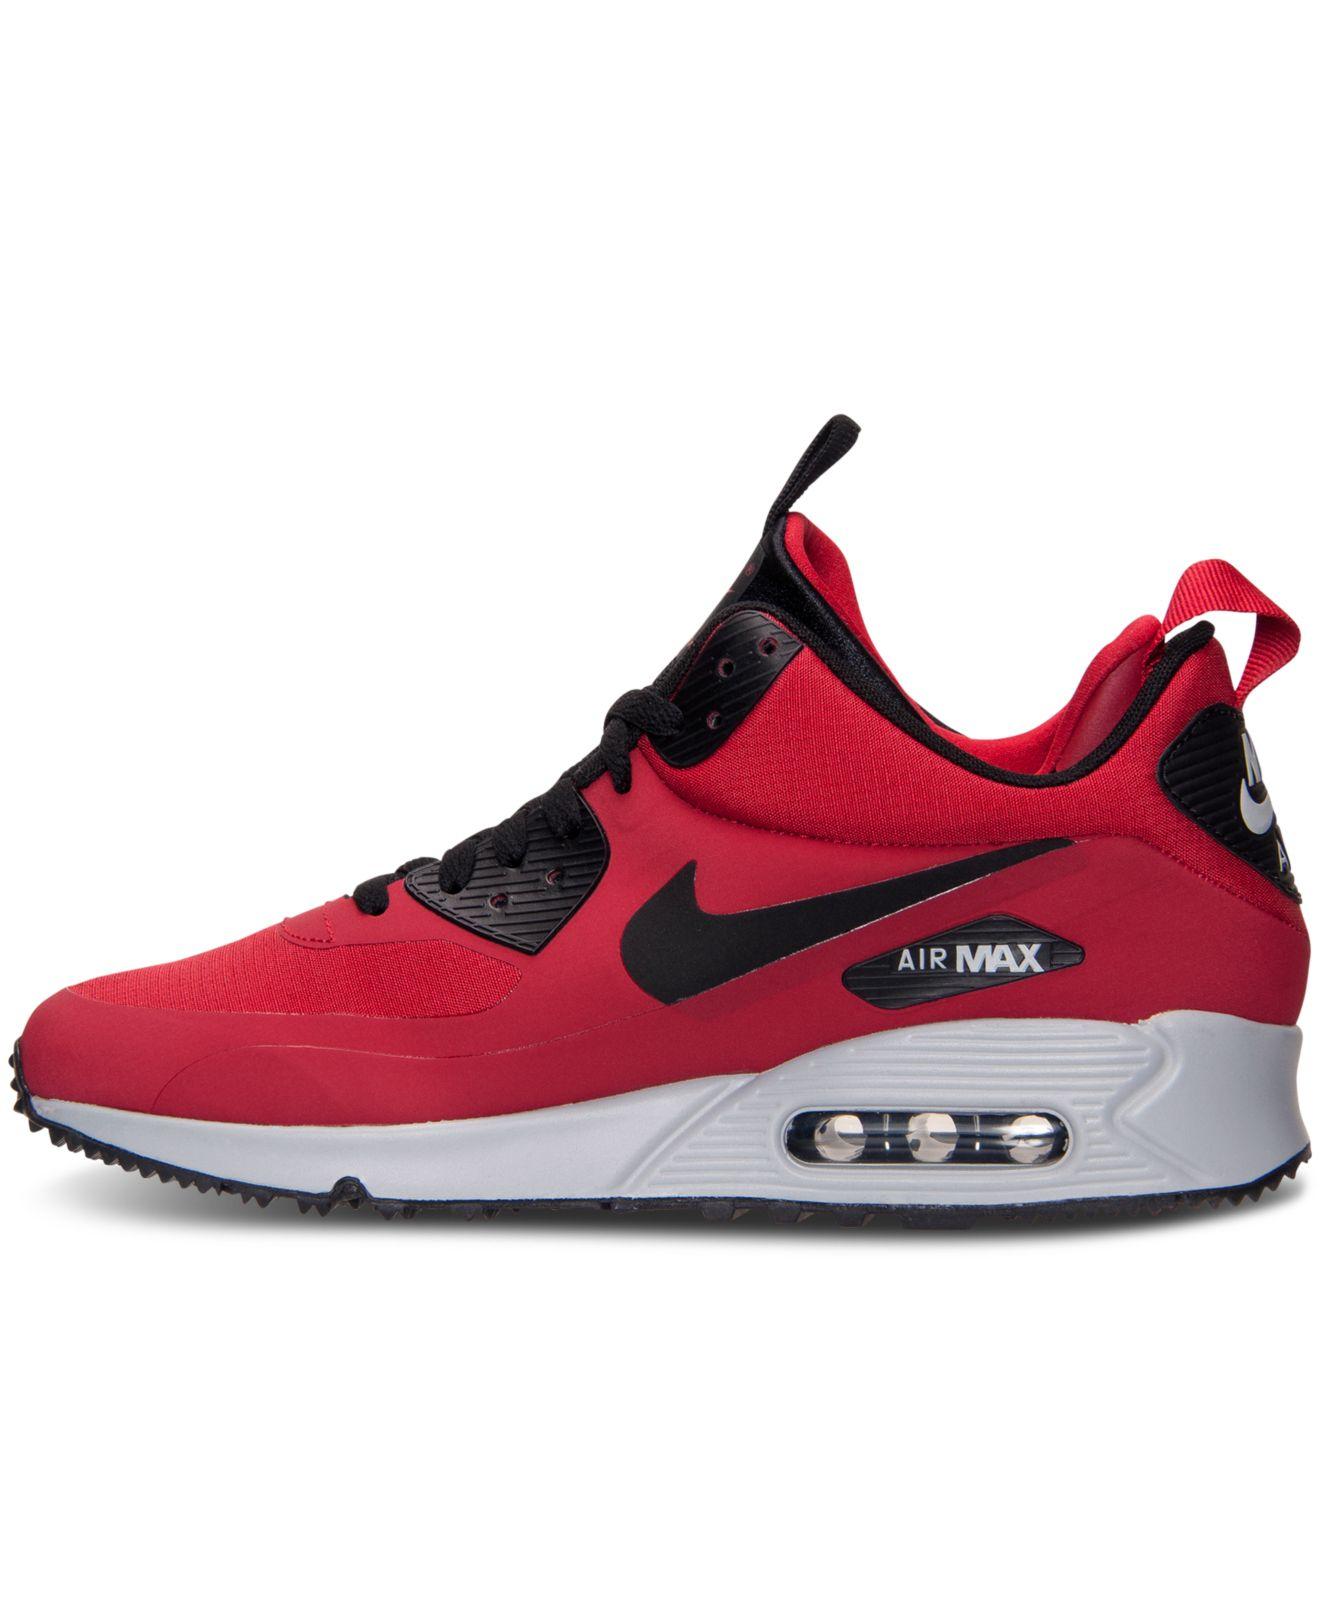 e09b1e79609 1320 x 1616 www.lyst.com. Nike Men  39 s Air Max 90 Mid Winter Casual  Sneakers ...